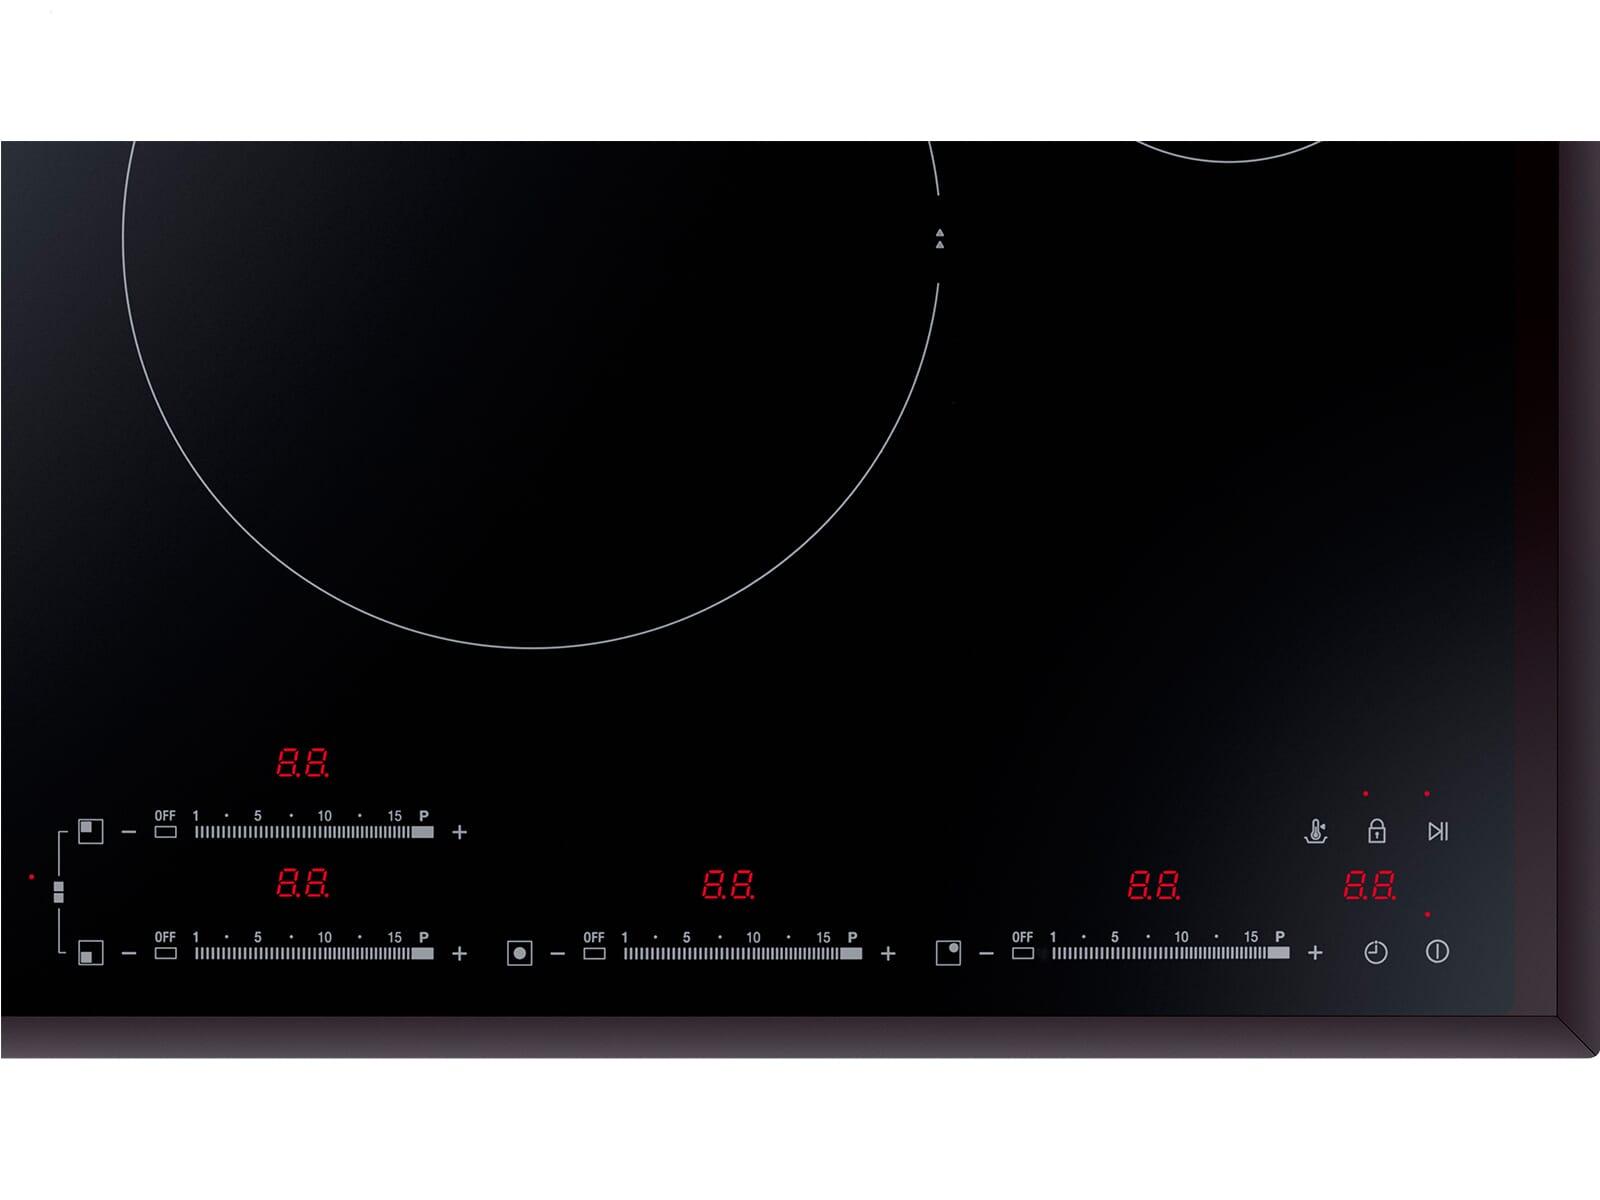 Samsung NZ84F7NC6AB/EG Induktionskochfeld autark